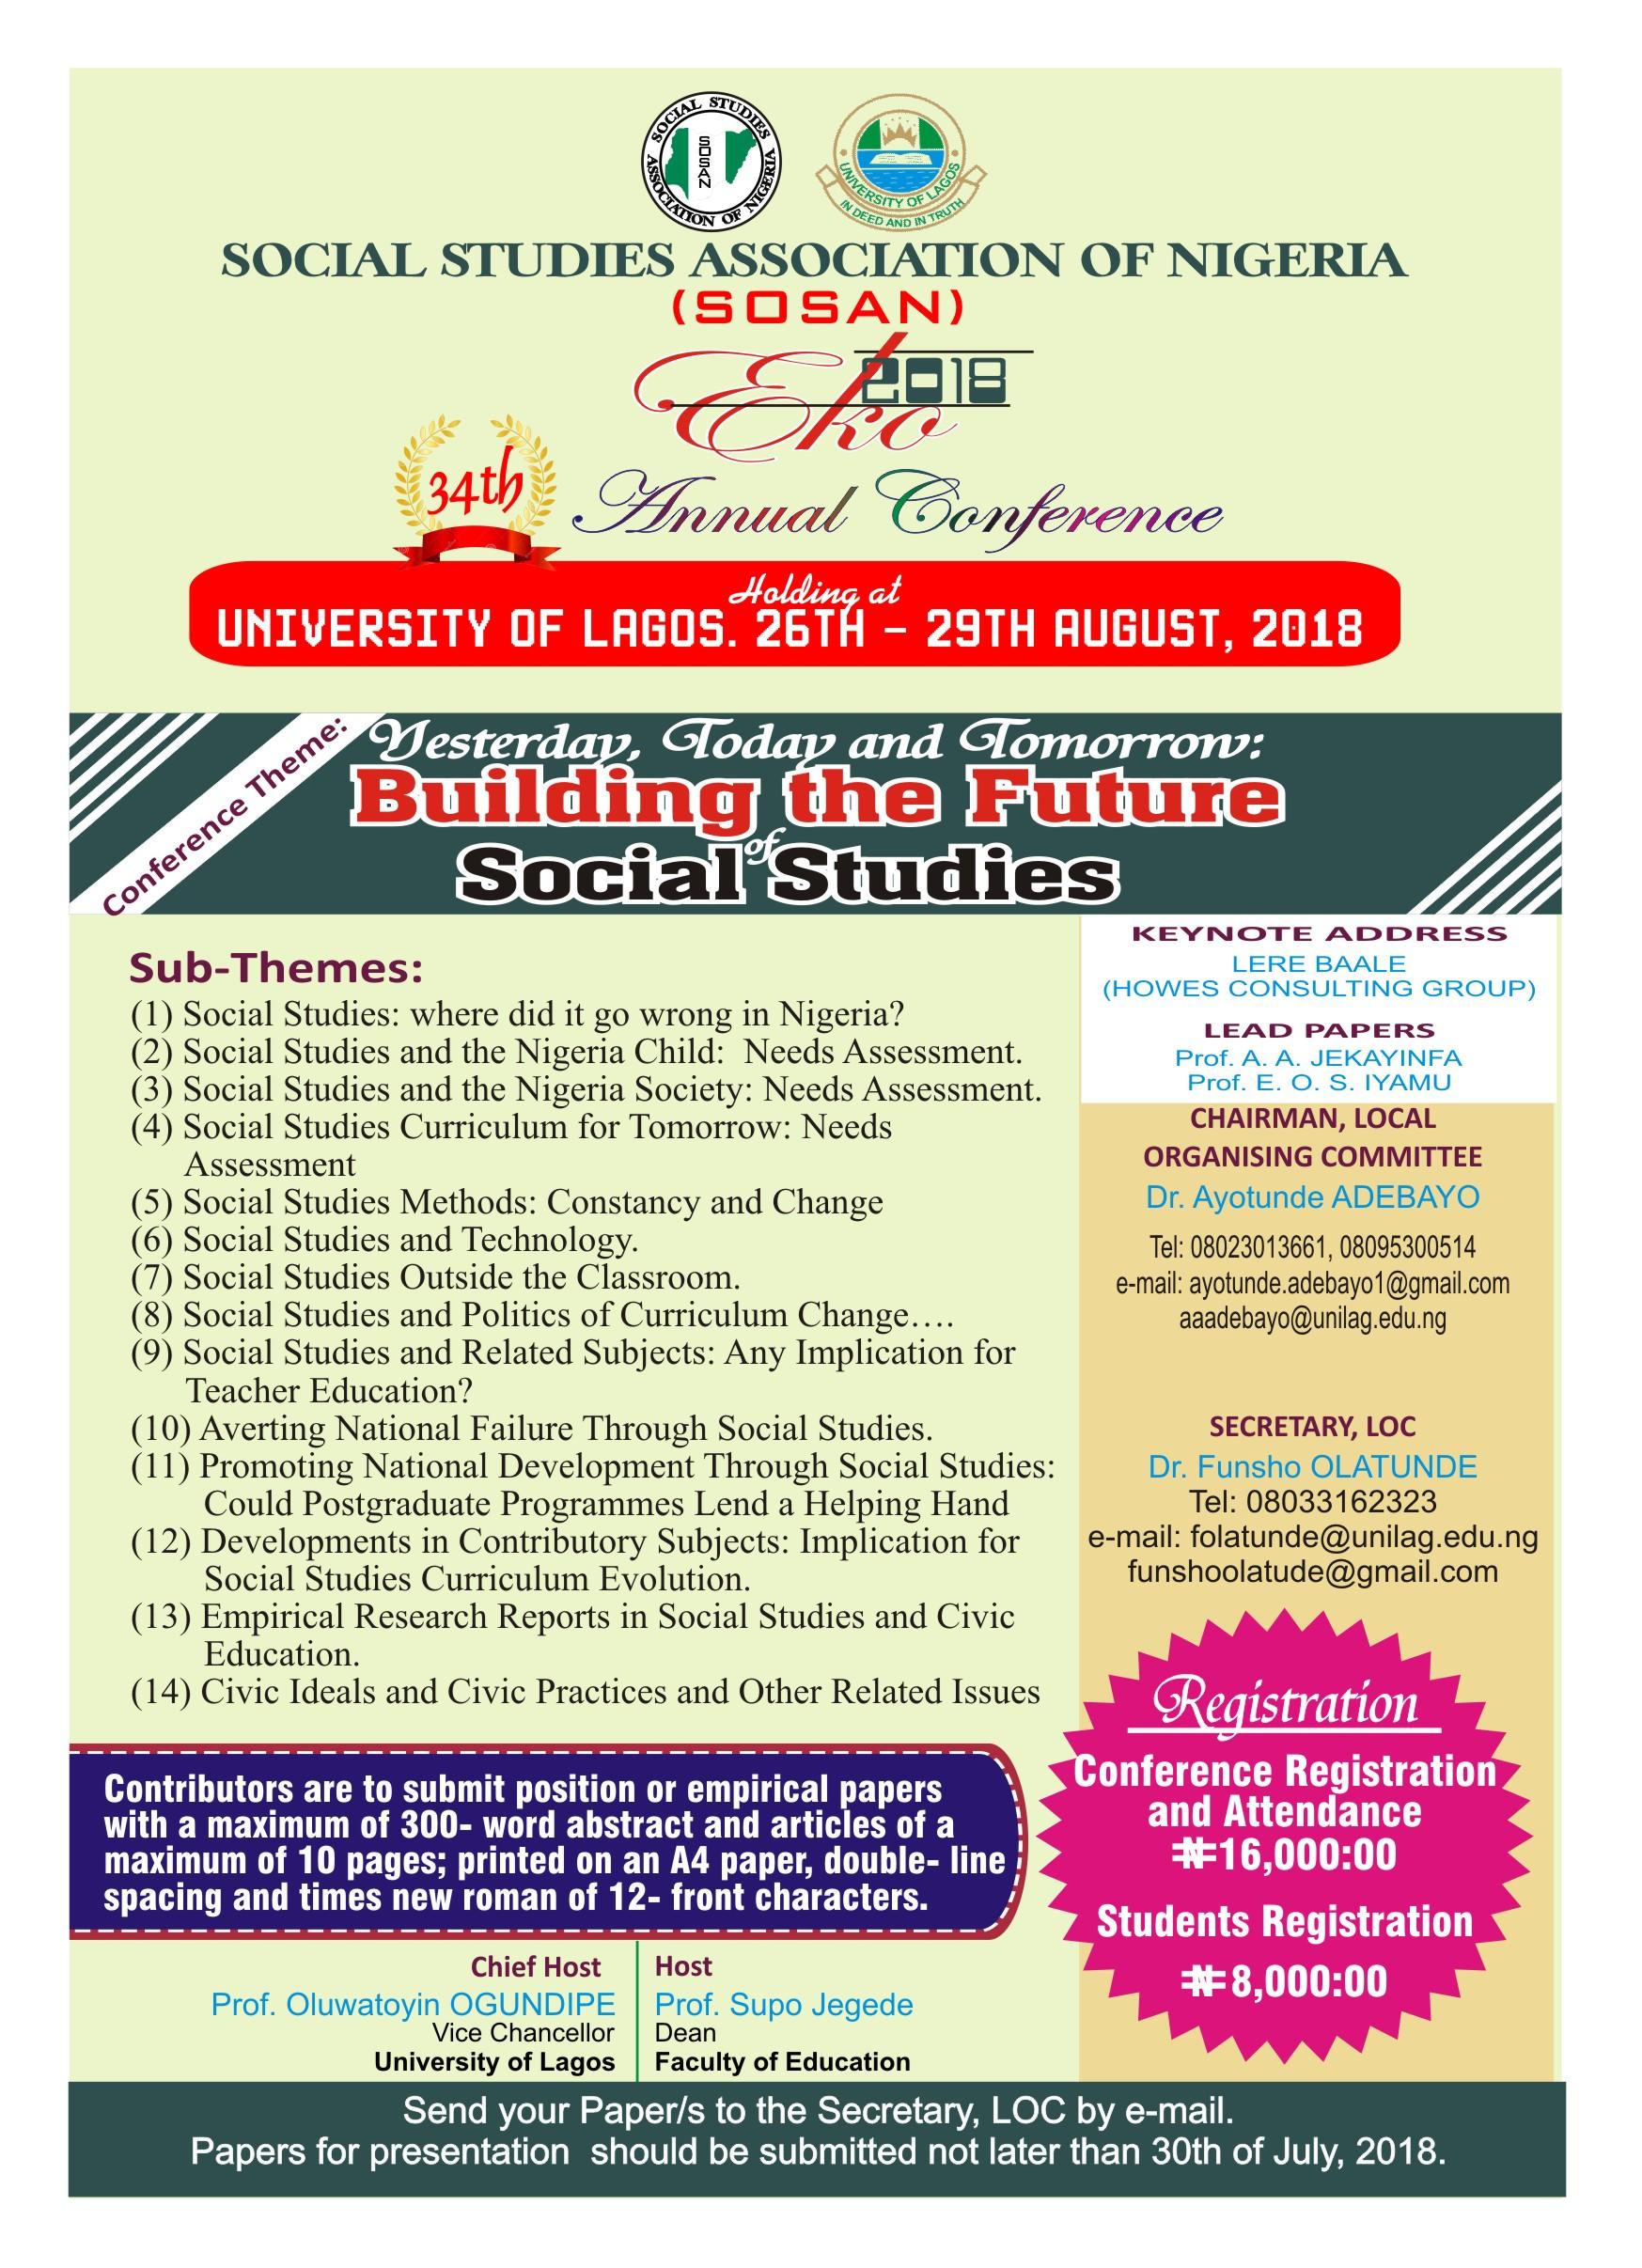 SOSAN 34th Conference Flyer